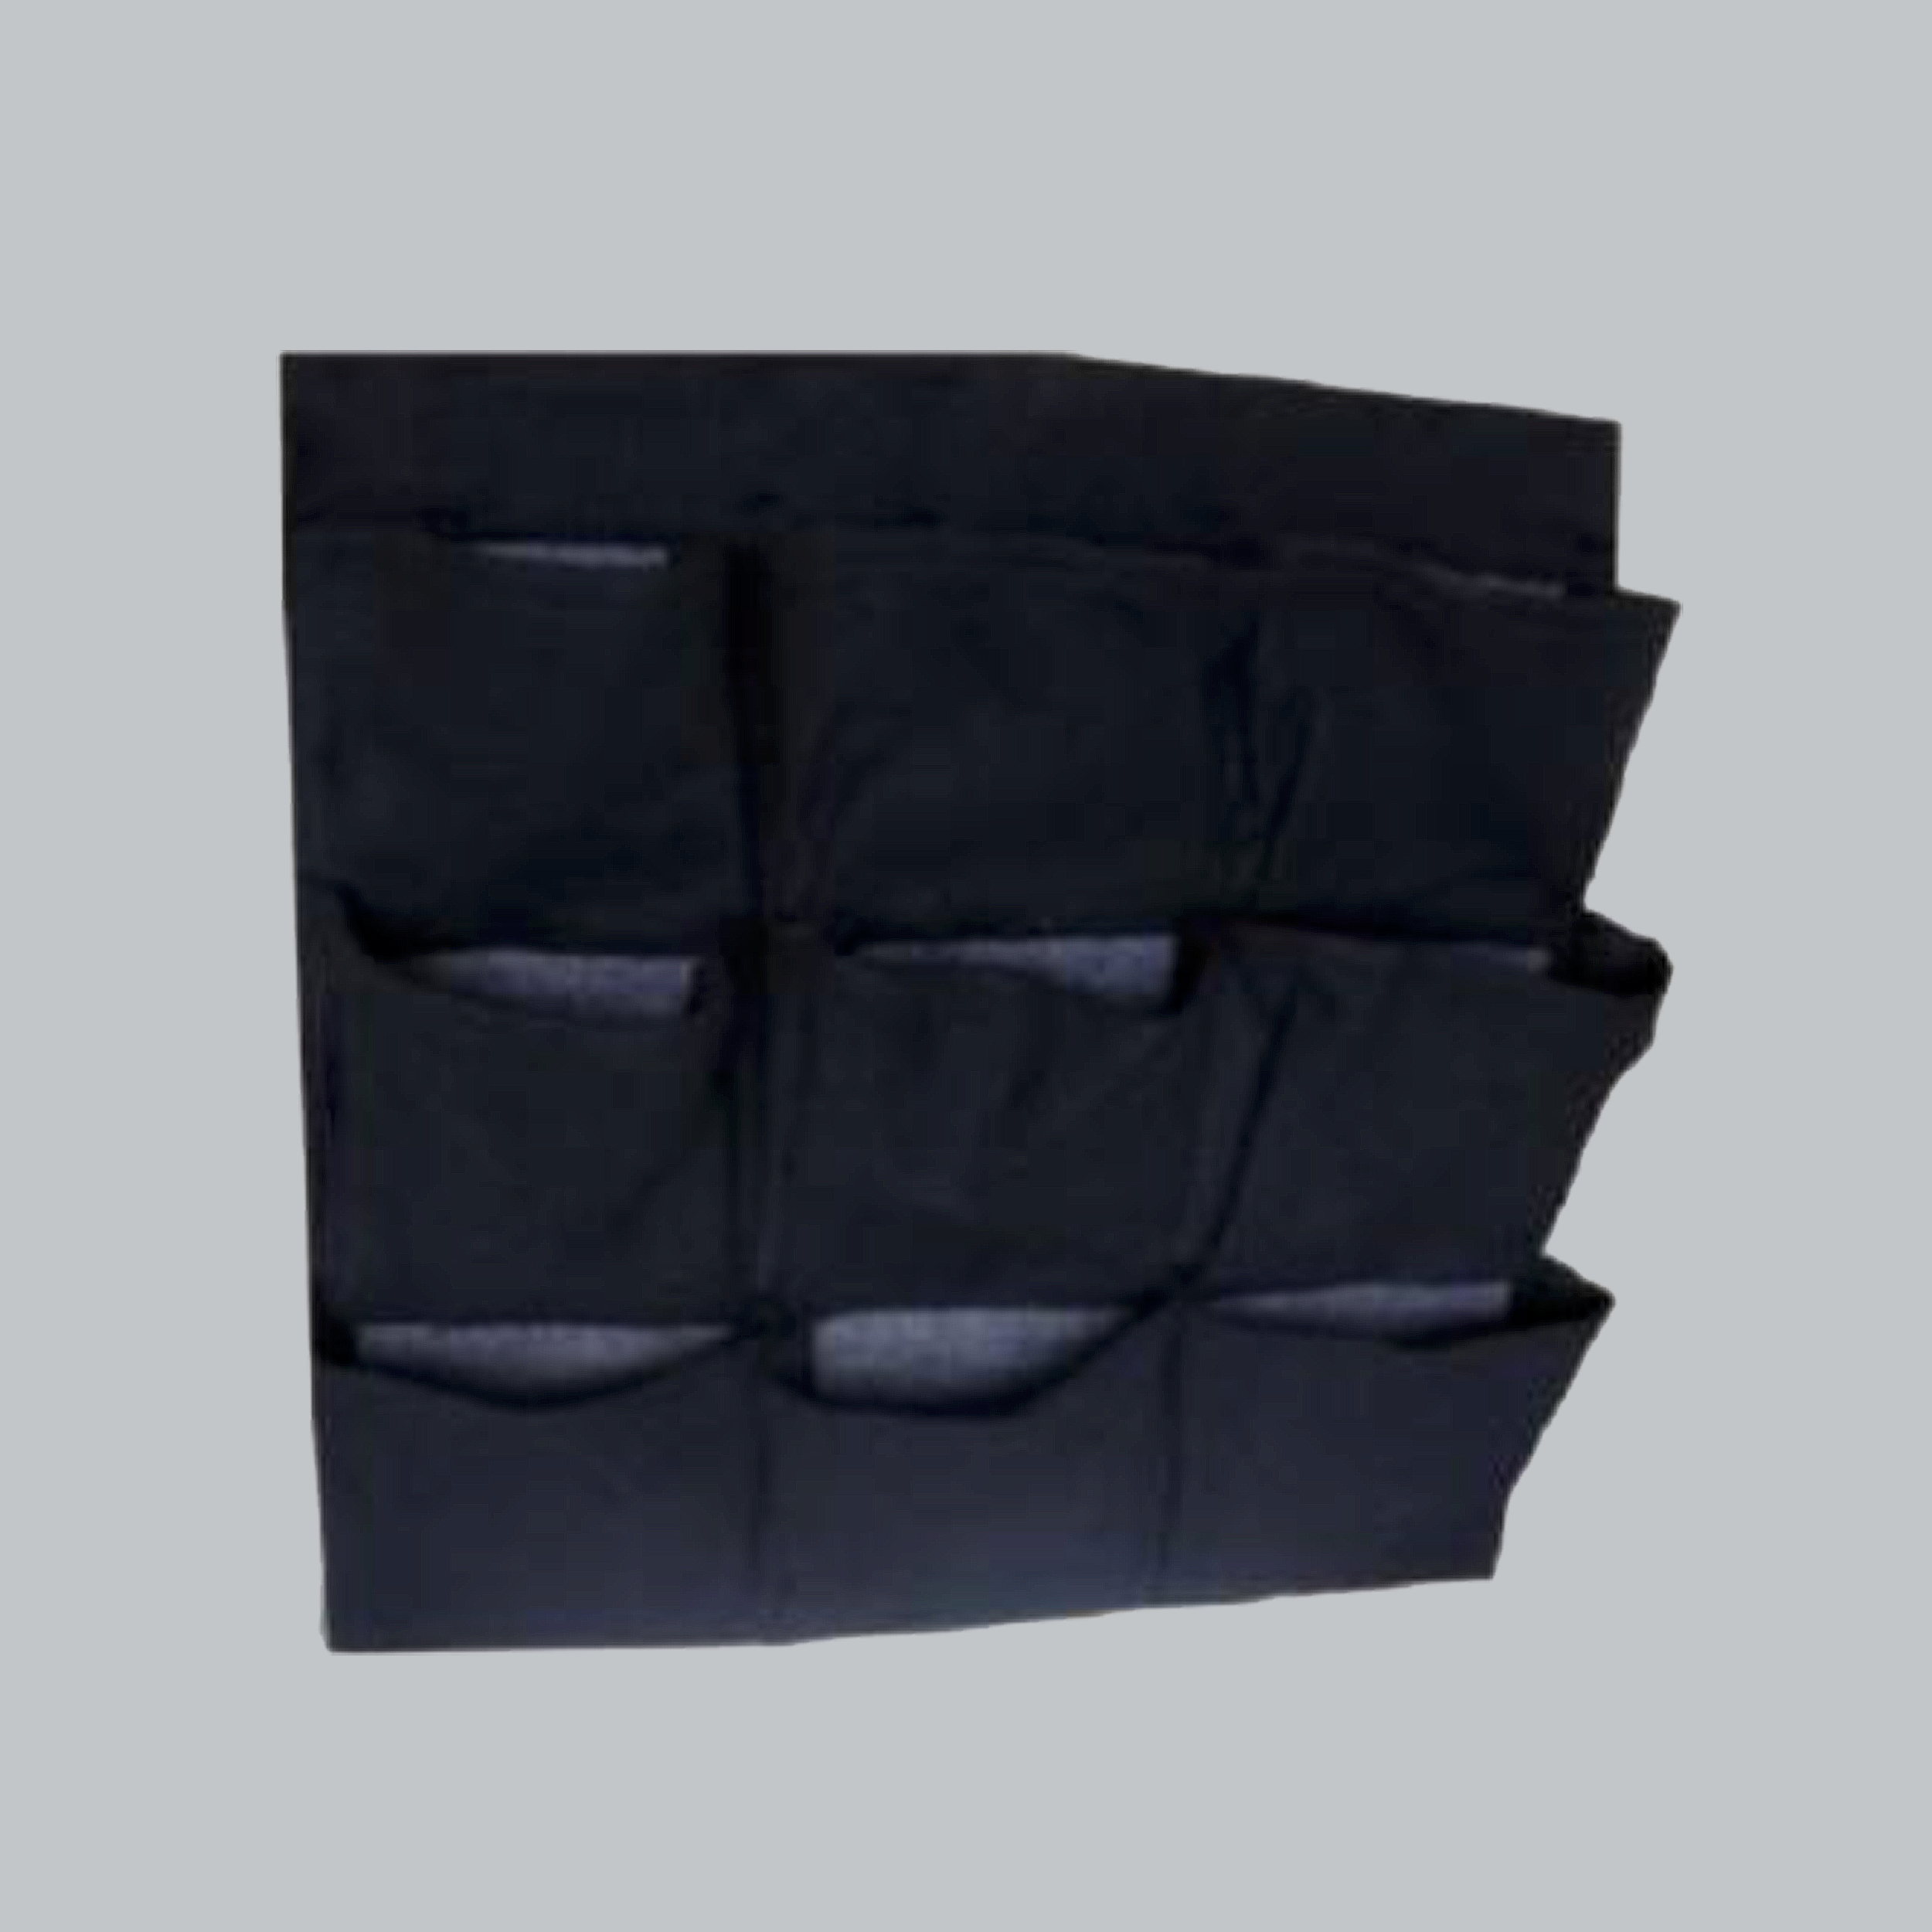 BIOPANELES - Sistema modular de paneles con bolsillos para jardines verticales con adaptación al sistema de riego.